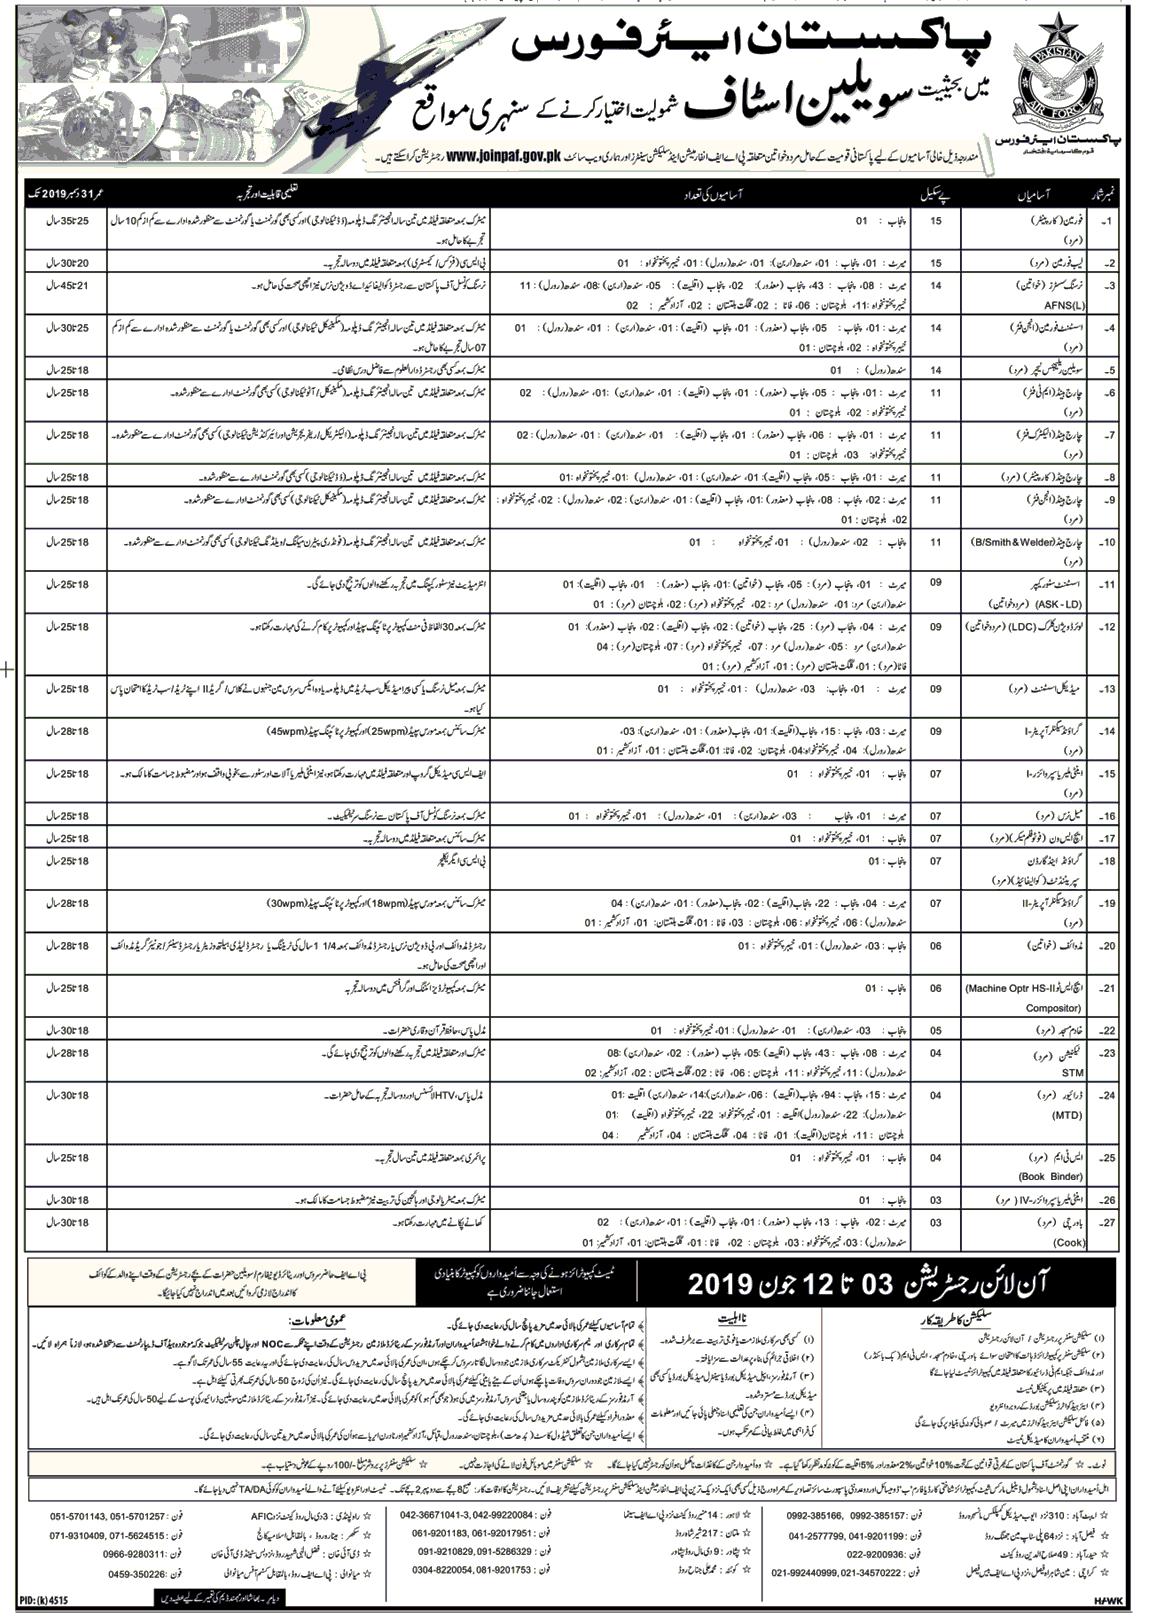 Join Pak Air Force as Civilian Jobs 2019 Airforce Jobs